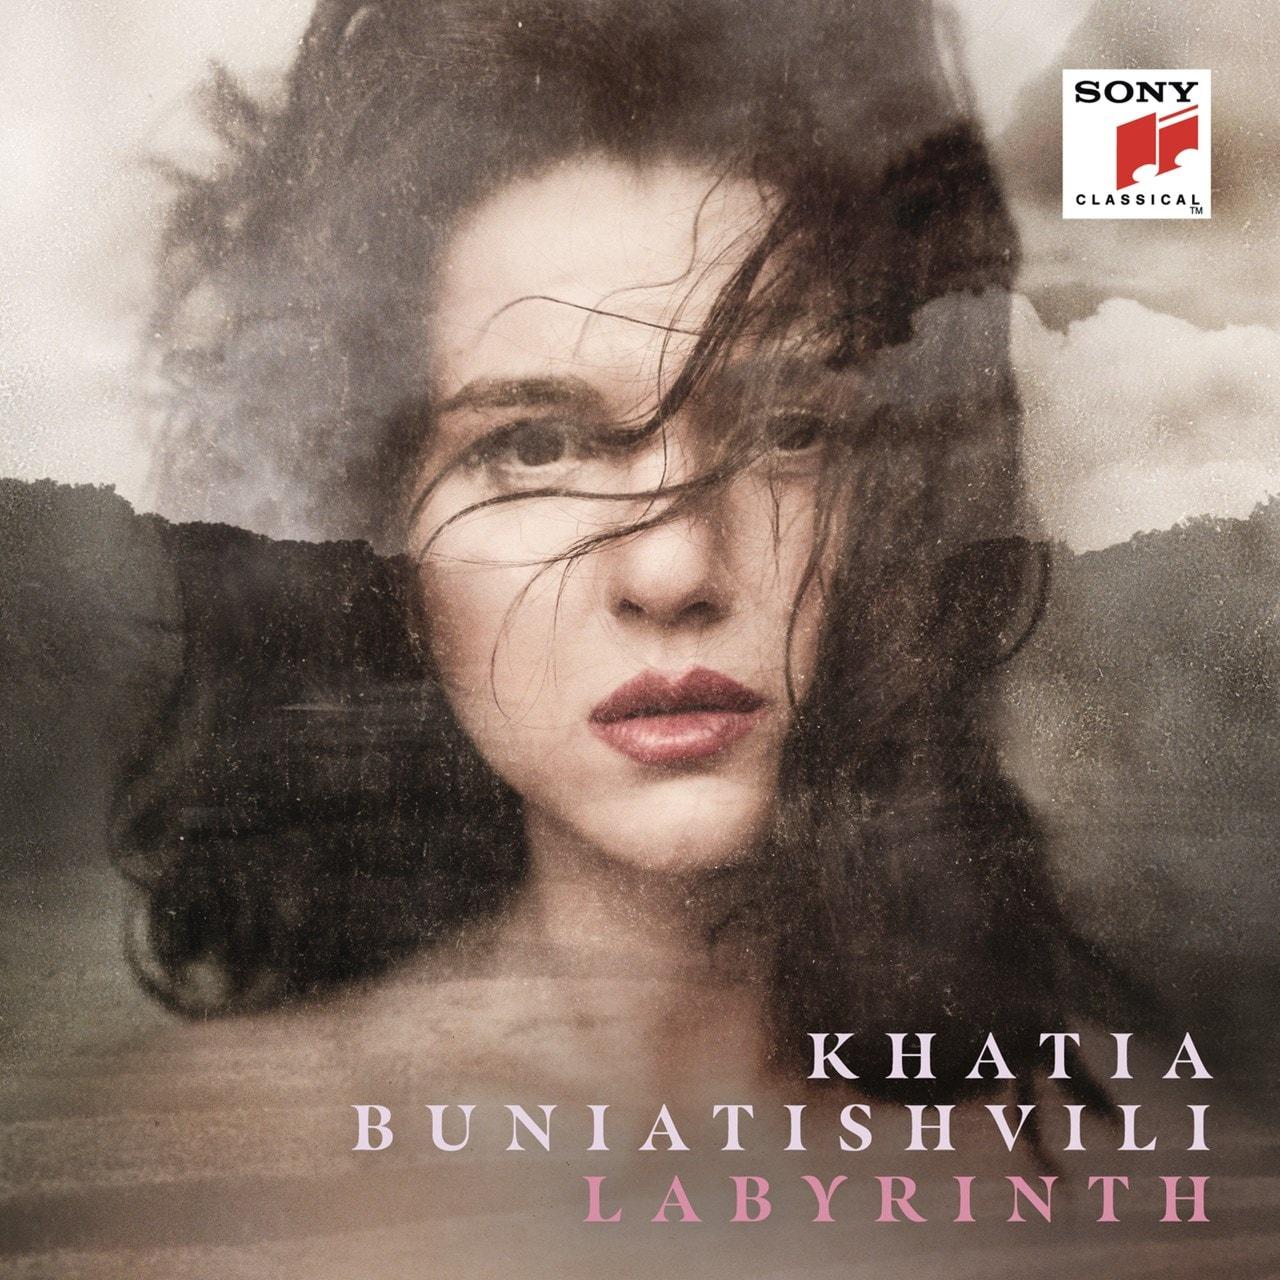 Khatia Buniatishvili: Labyrinth - 1